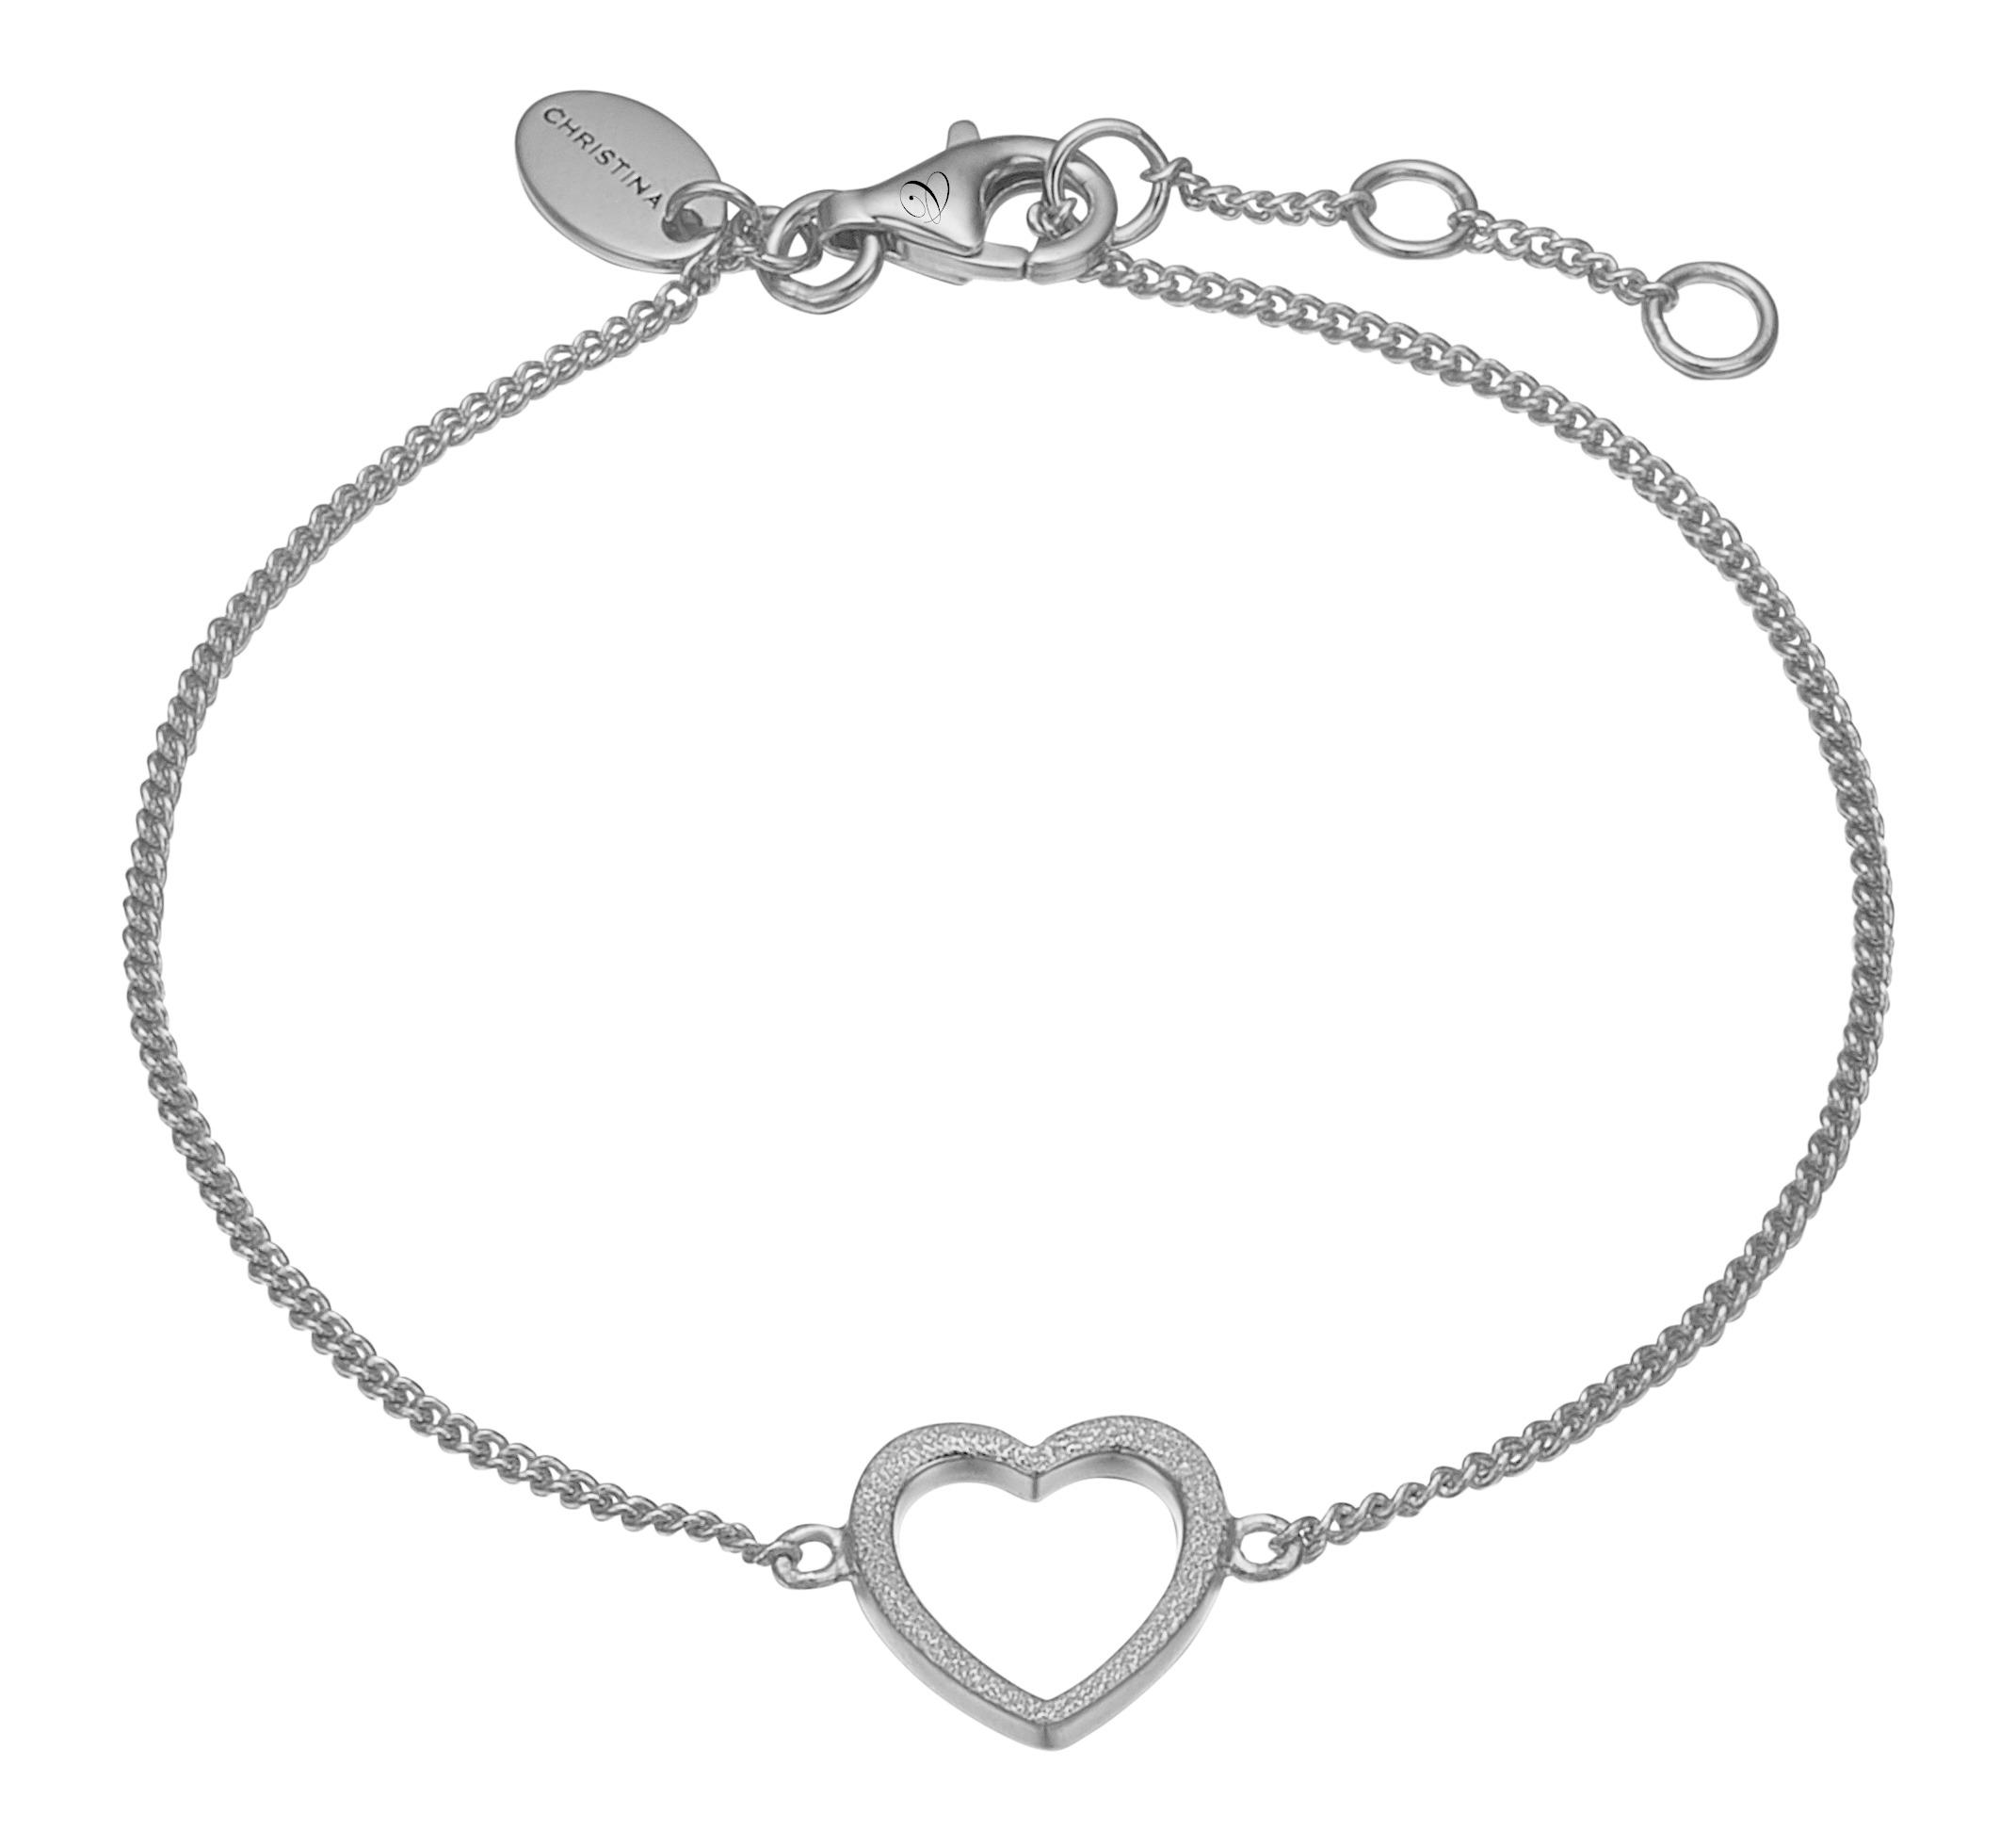 christina watches Christina sølv armlænke magic heart - 601-s17 fra brodersen + kobborg